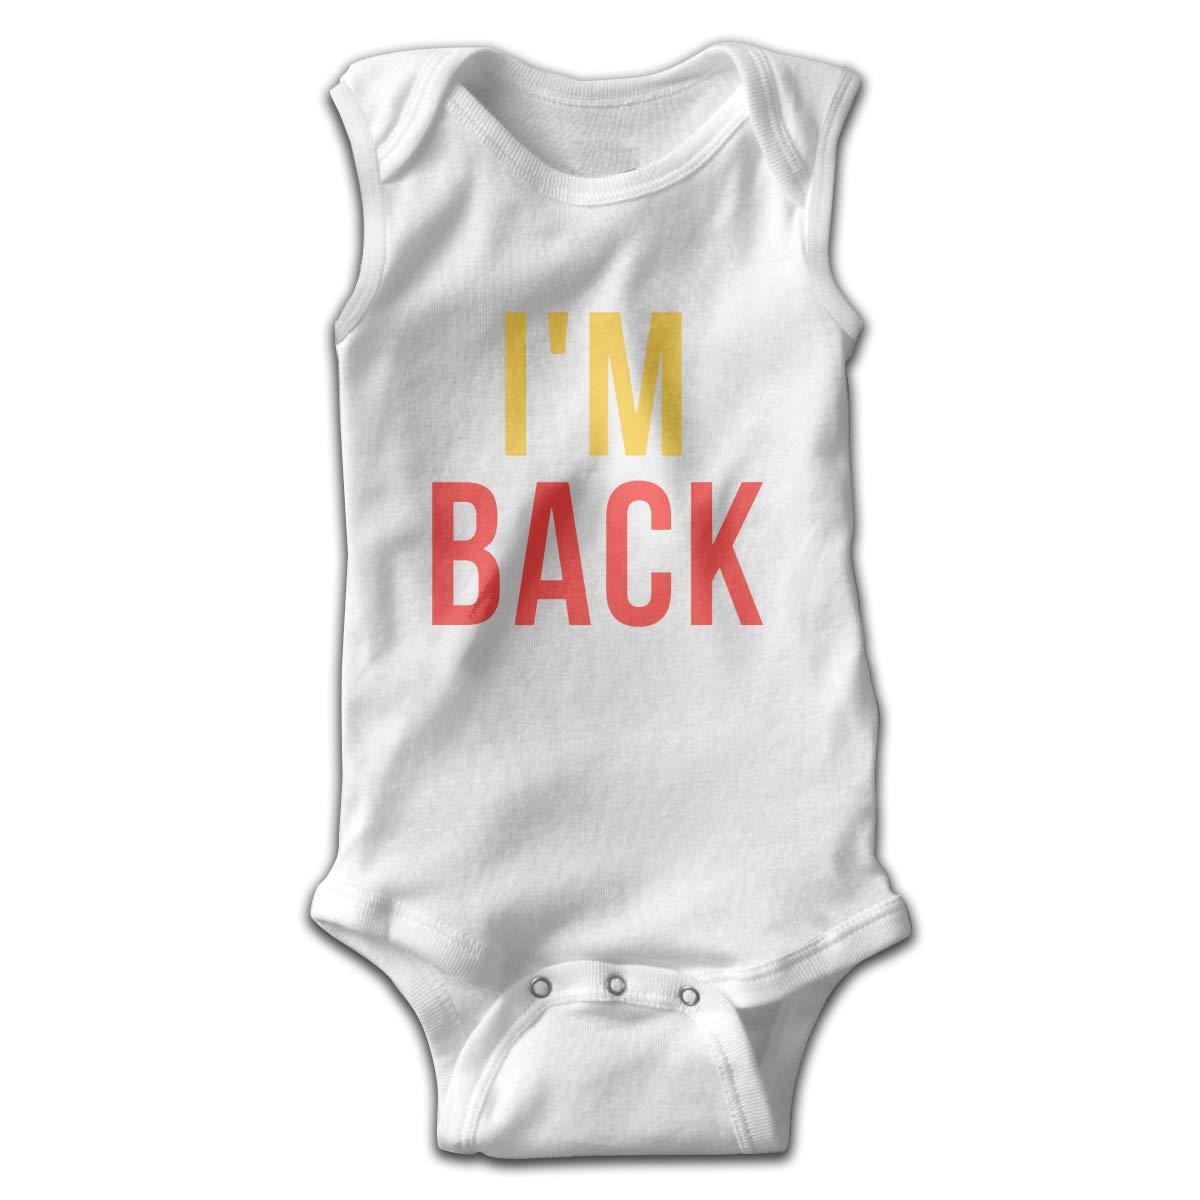 Efbj Newborn Baby Boys Rompers Sleeveless Cotton Jumpsuit,Im Back Bodysuit Winter Pajamas